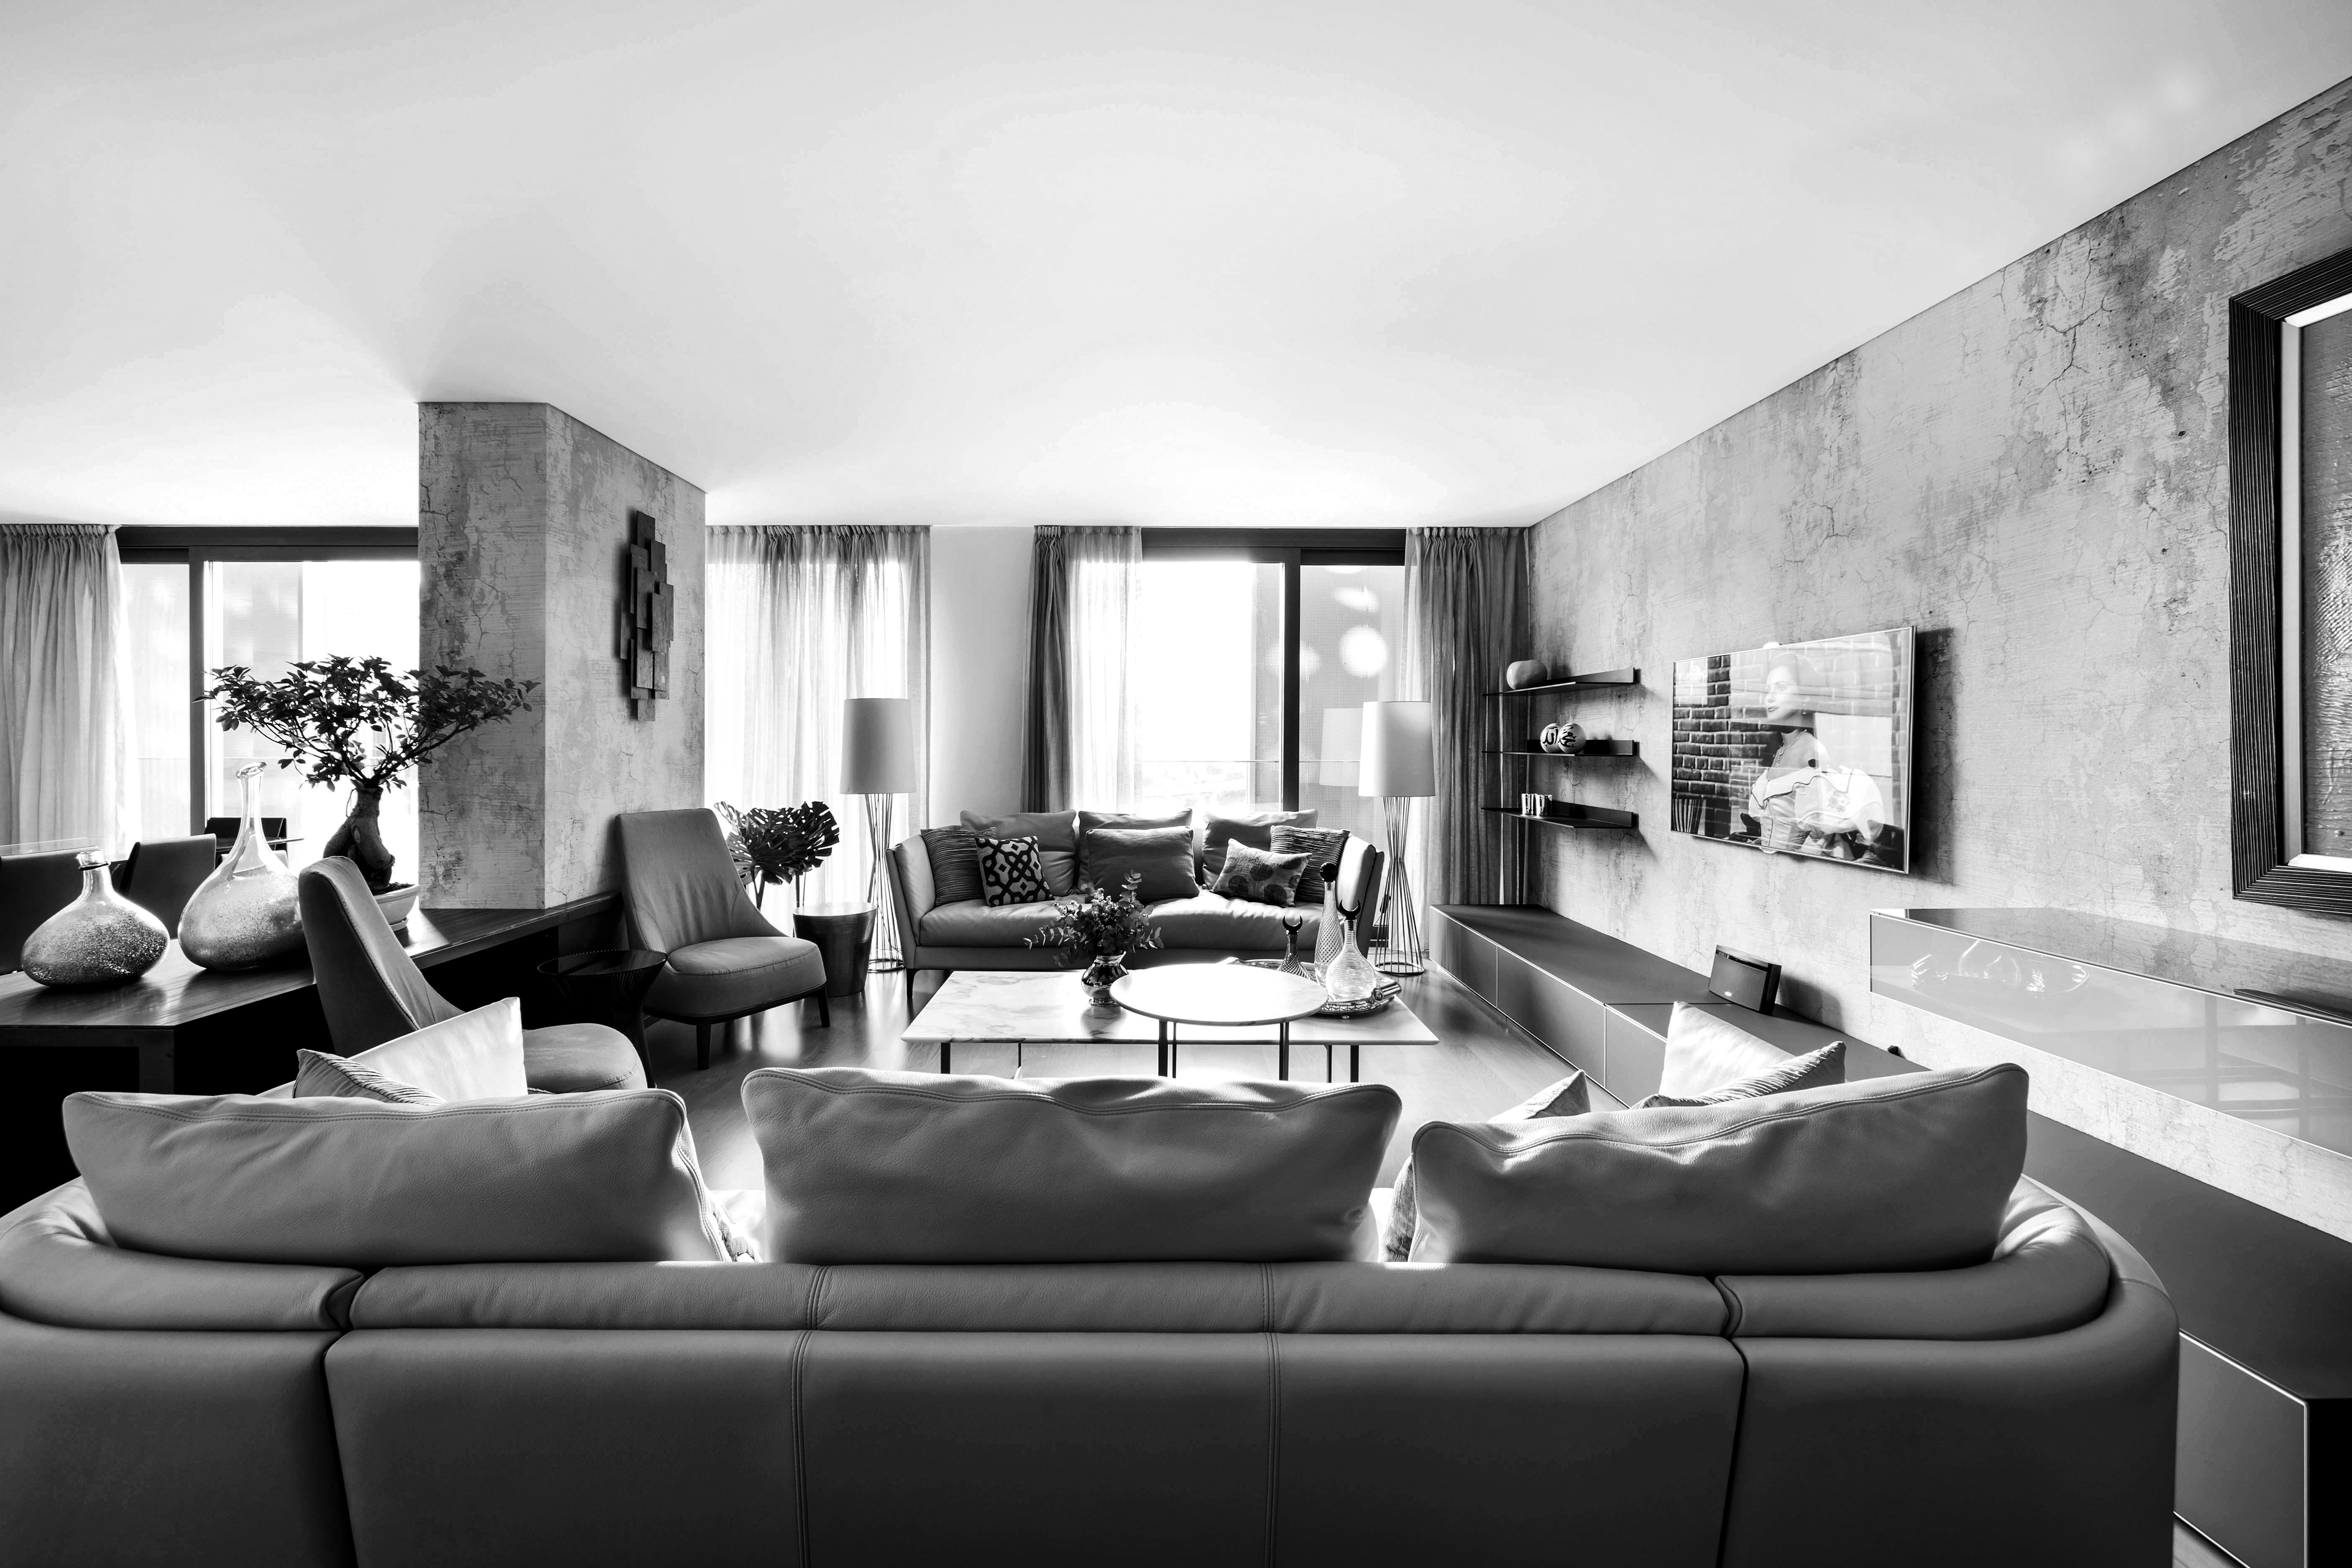 DK House Interiors